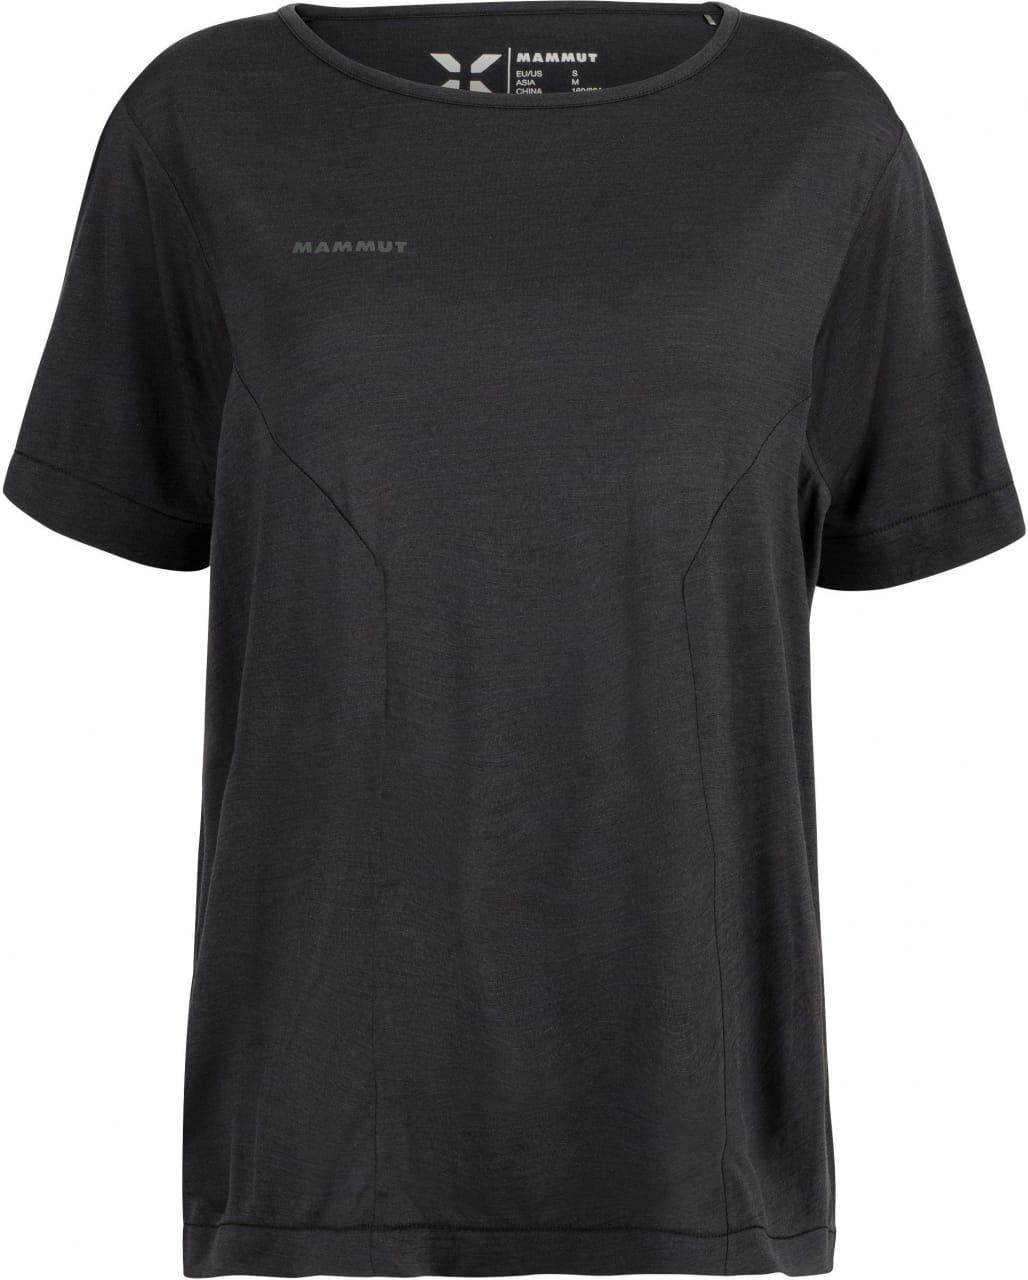 Trička Mammut Uetliberg T-Shirts Women